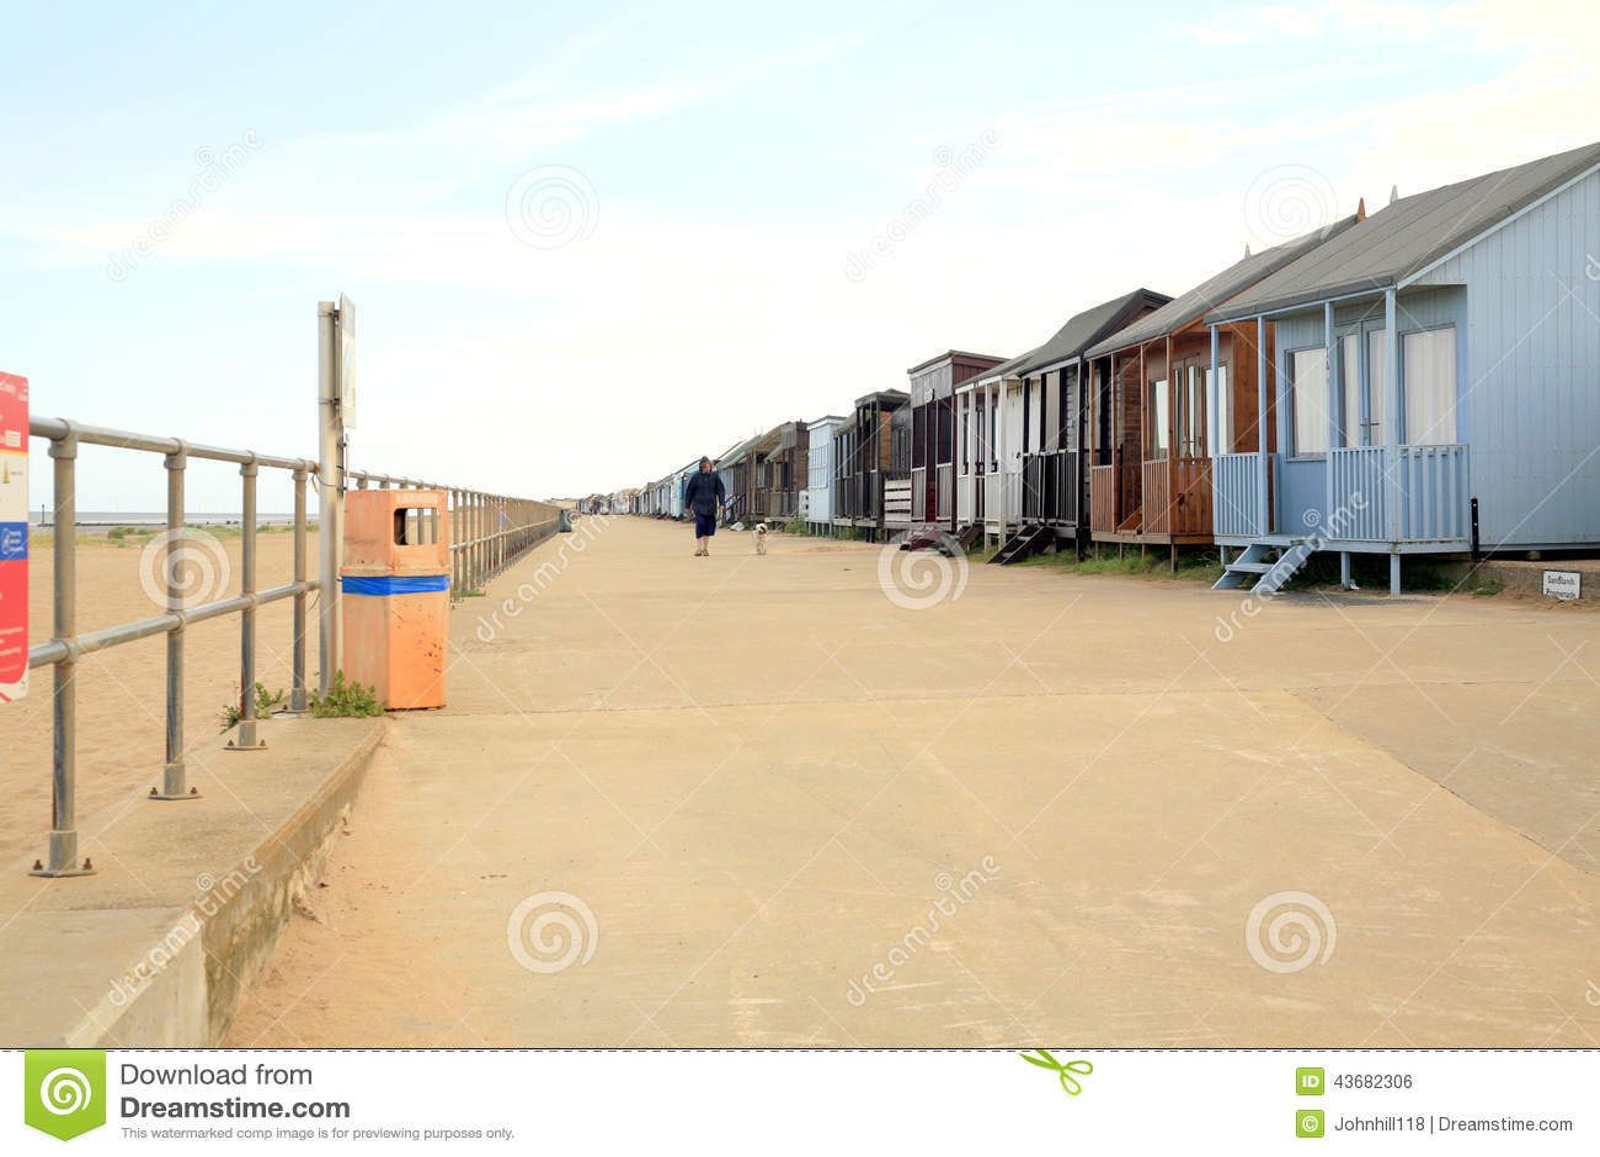 Beach Huts On Promenade